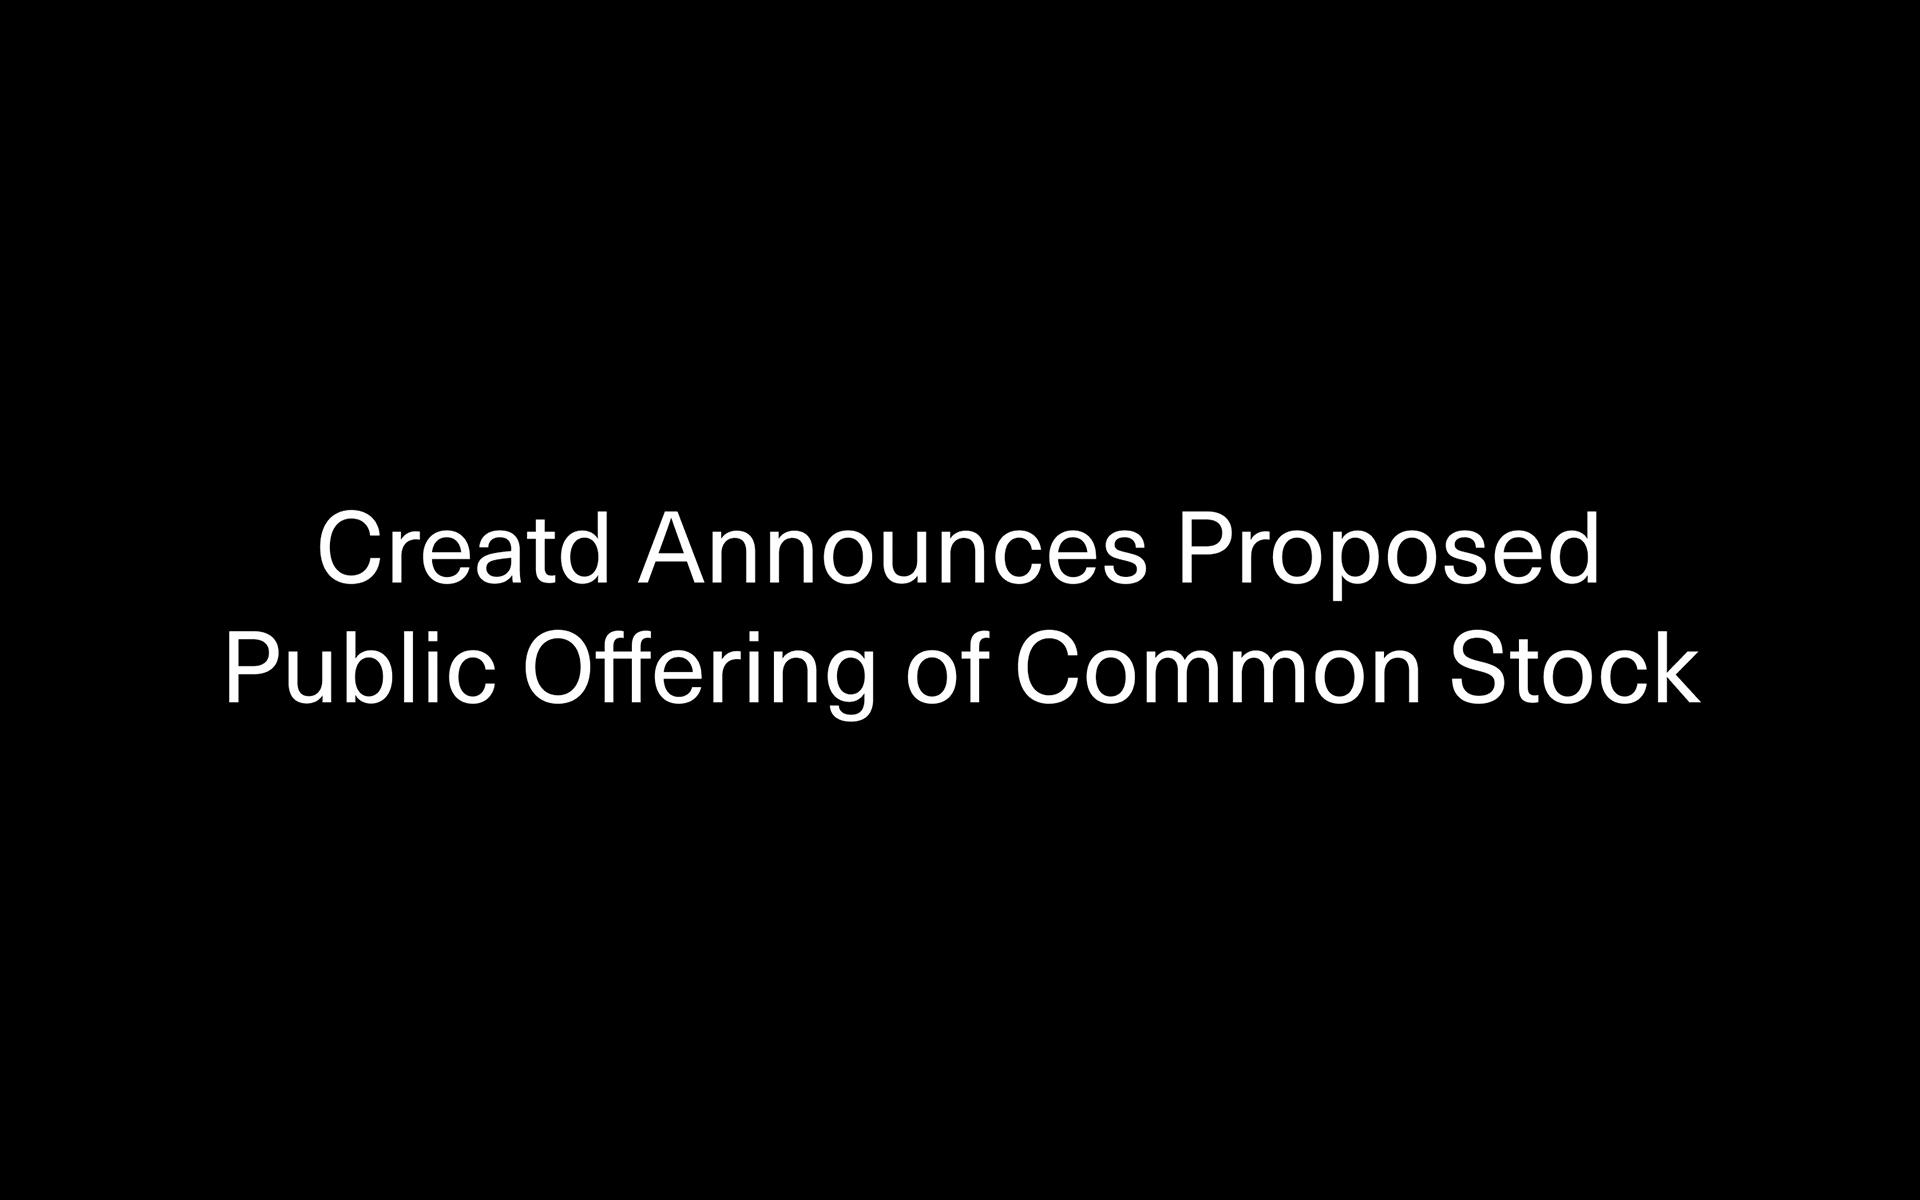 Creatd Announces Proposed Public Offering of Common Stock